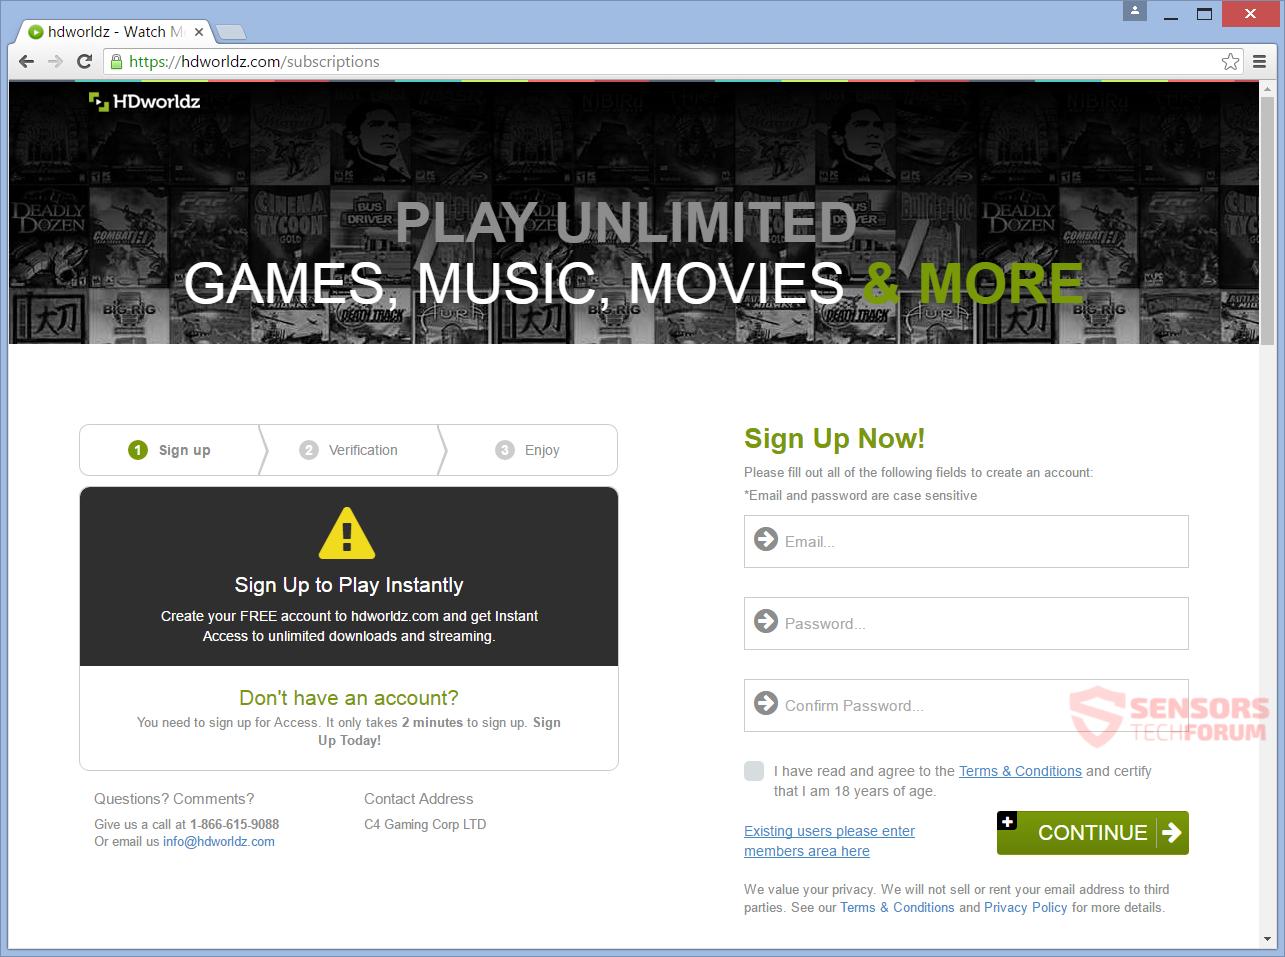 SensorsTechForum-hdworldz-com-hd-worldz-movies-games-music-registration